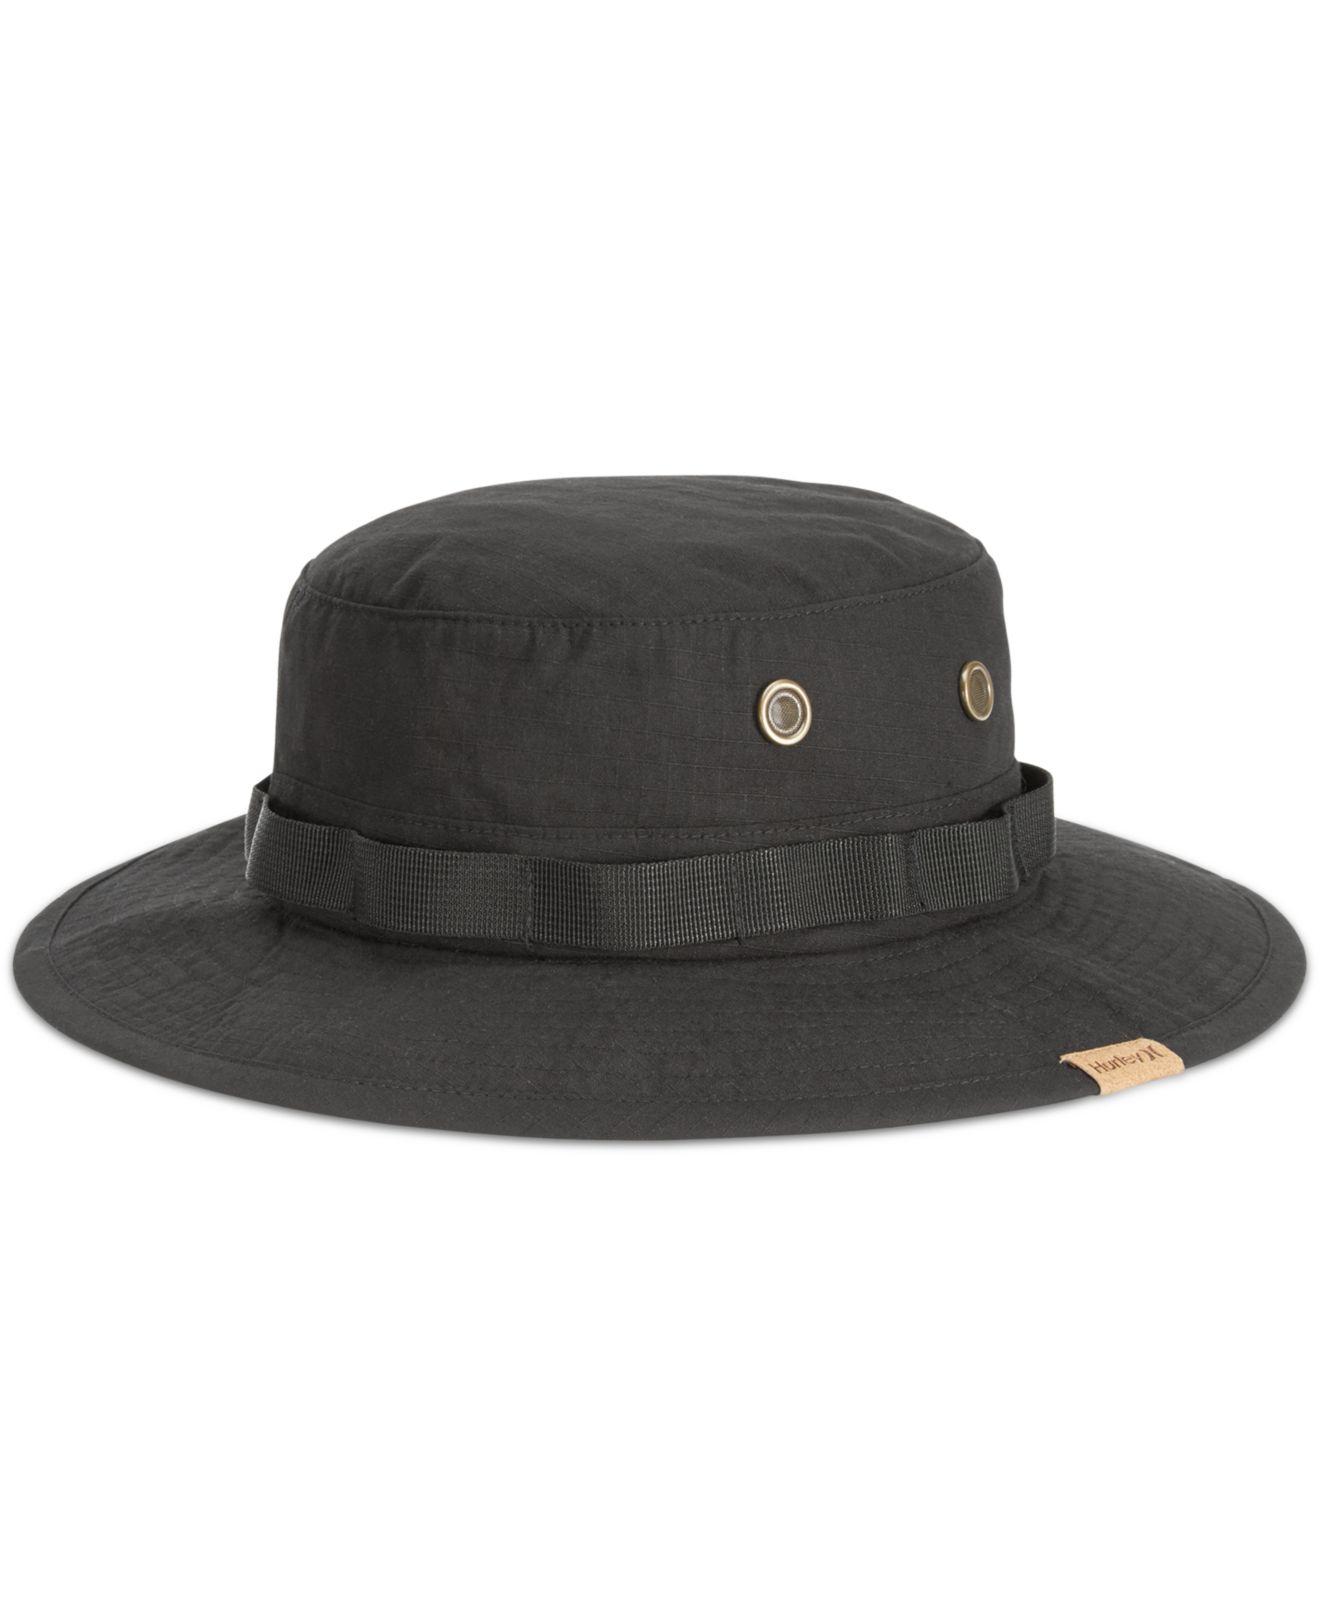 68005874 ... discount code for lyst hurley safari bucket hat in black for men babca  f812e